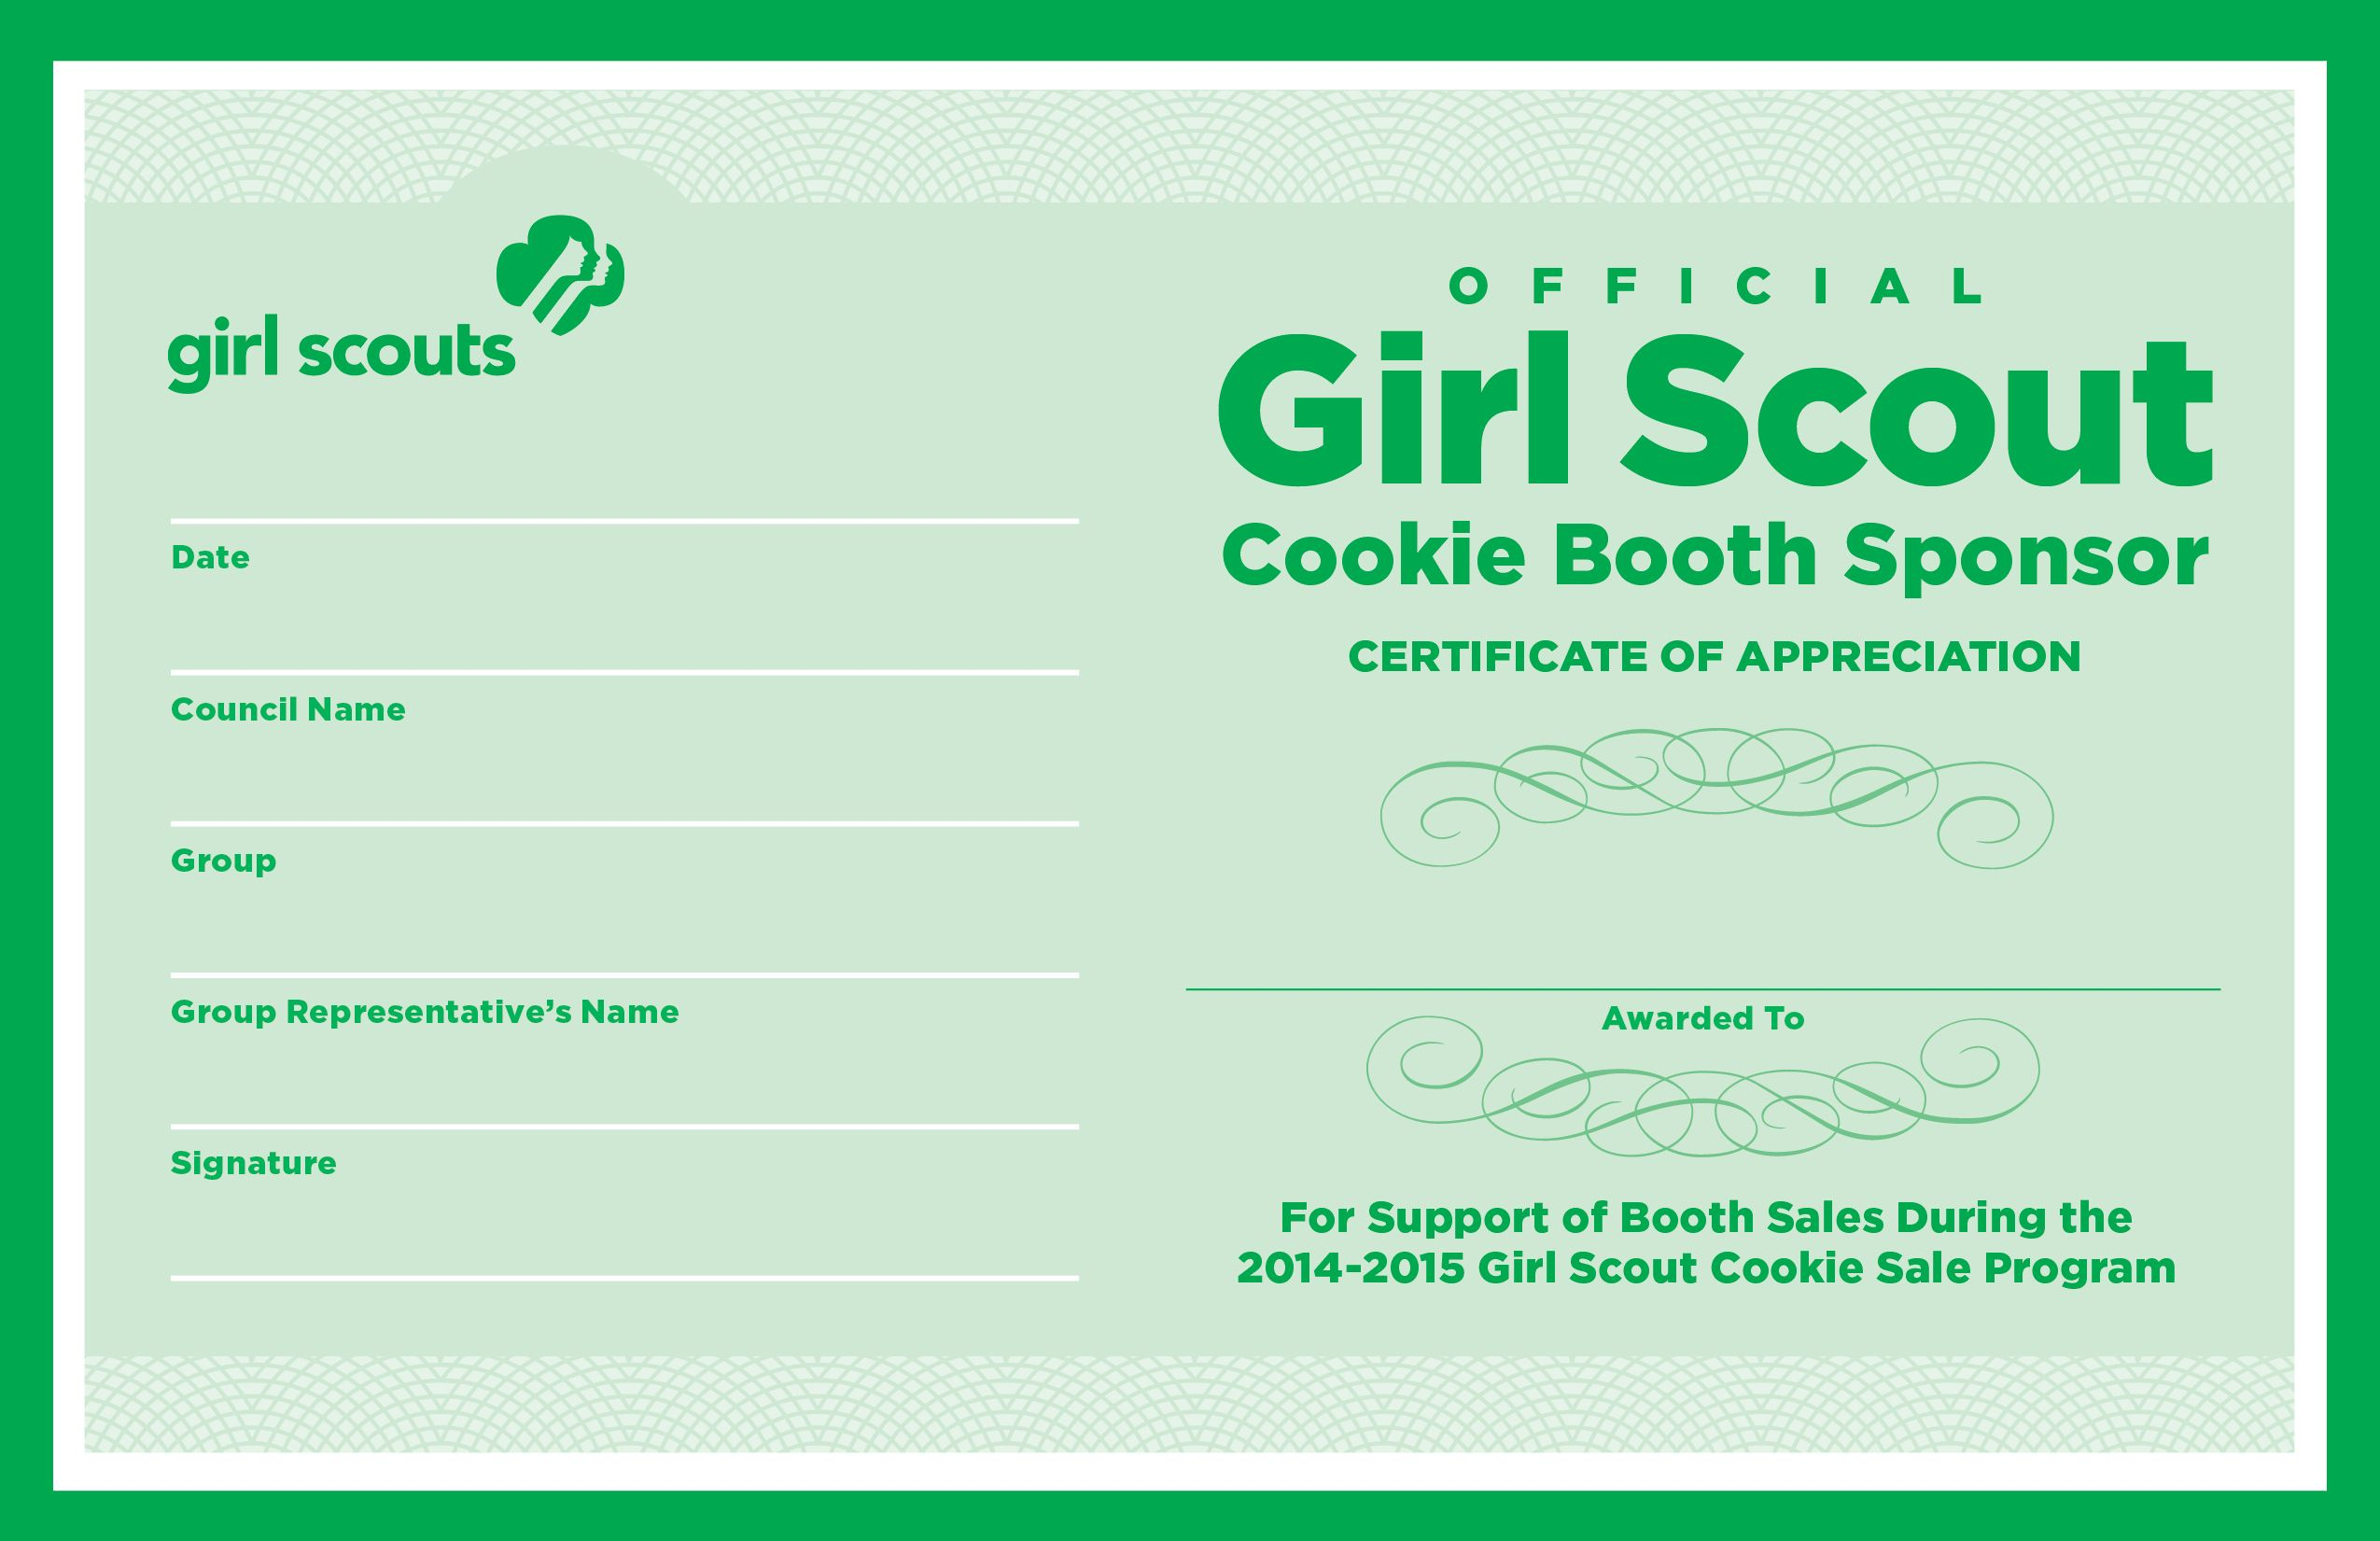 Volunteer certificates of appreciation for girl scout google volunteer certificates of appreciation for girl scout google search yadclub Image collections